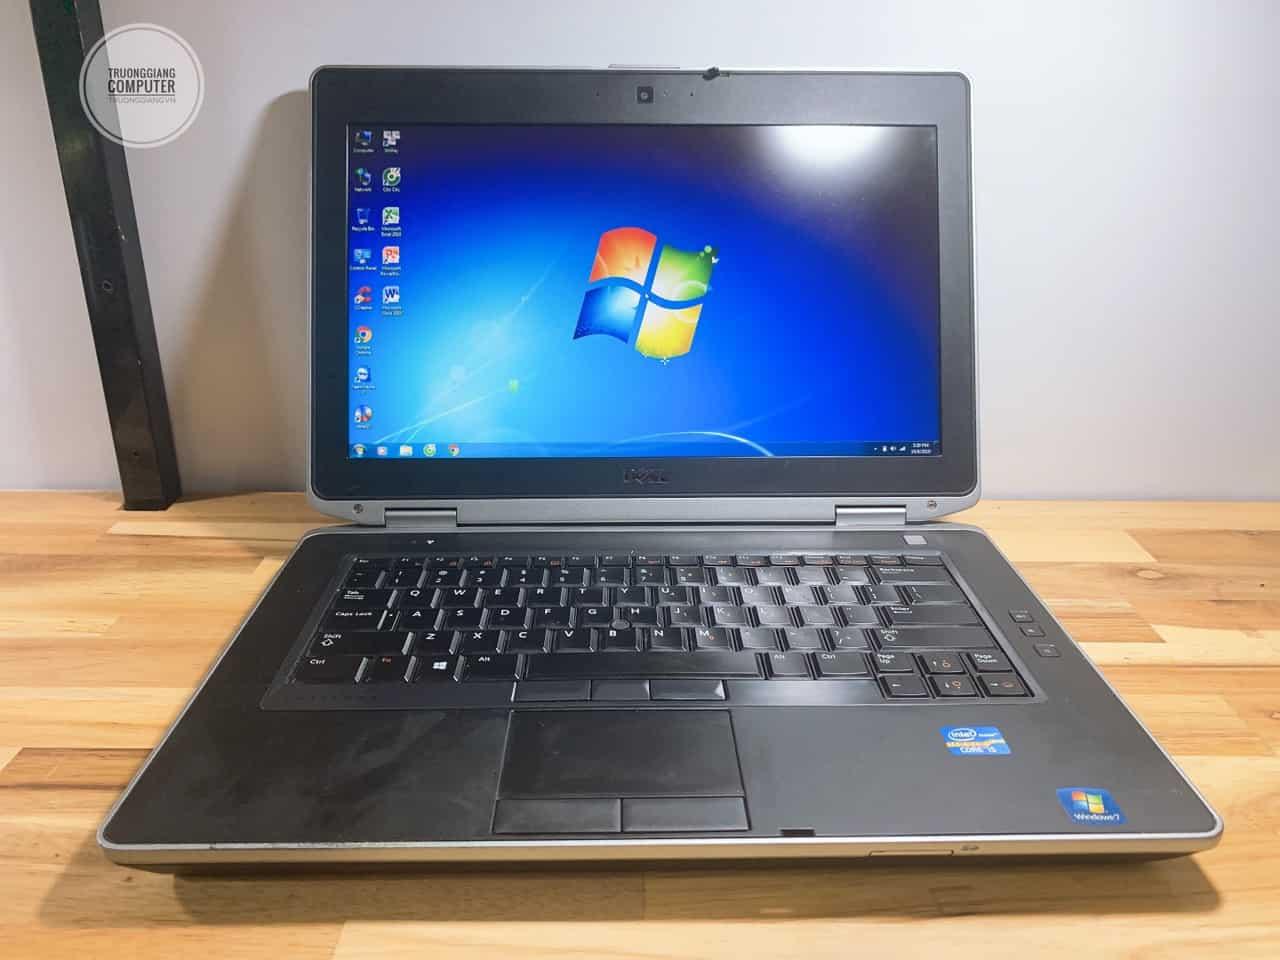 màn hình Dell Latitude E6430 Core i5 3320M